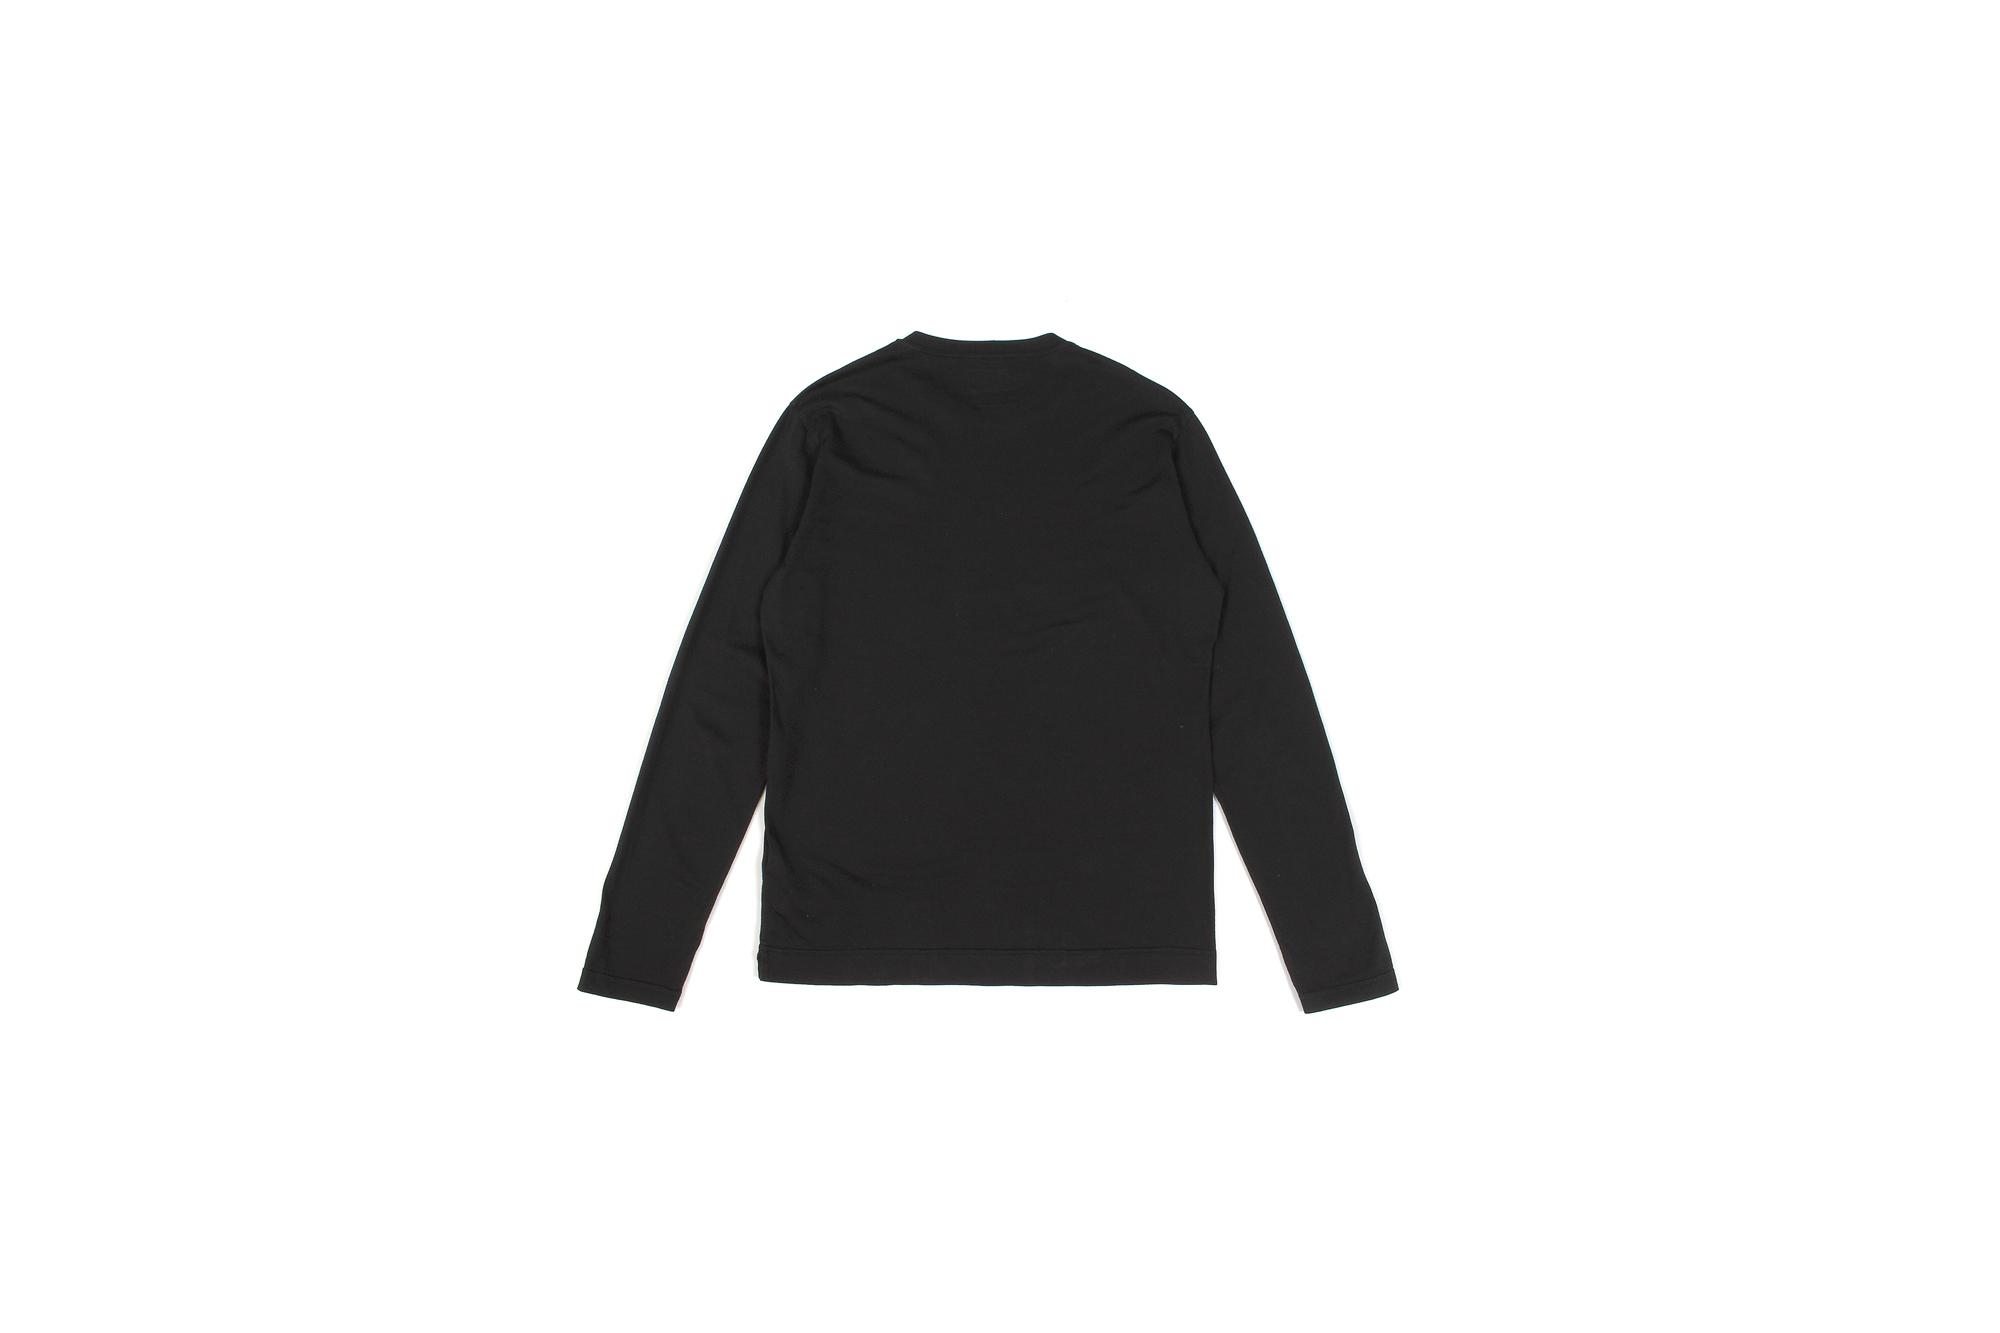 FEDELI (フェデリ) Long Sleeve Crew Neck T-shirt (ロングスリーブ Tシャツ) ギザコットン ロングスリーブ Tシャツ BLACK (ブラック・36) made in italy (イタリア製) 2021 春夏 【ご予約受付中】愛知 名古屋 Alto e Diritto altoediritto アルトエデリット ロンT ロングTシャツ